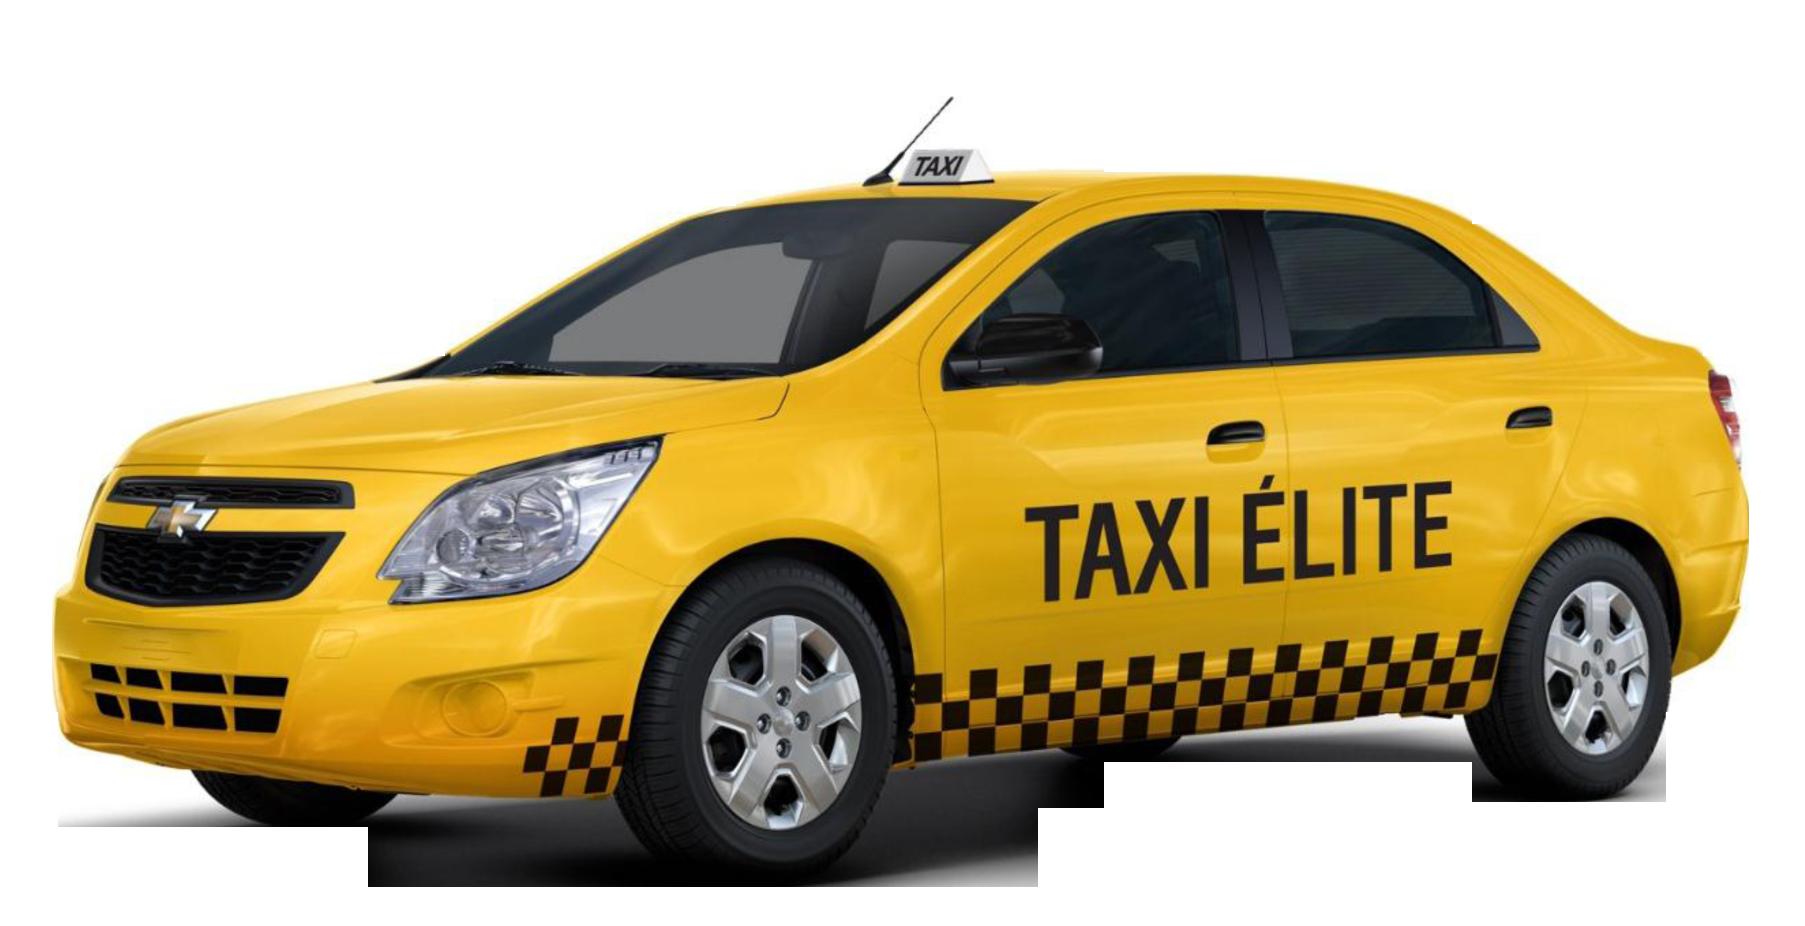 Taxi Png Image Taxi Taxi Service Taxi Cab